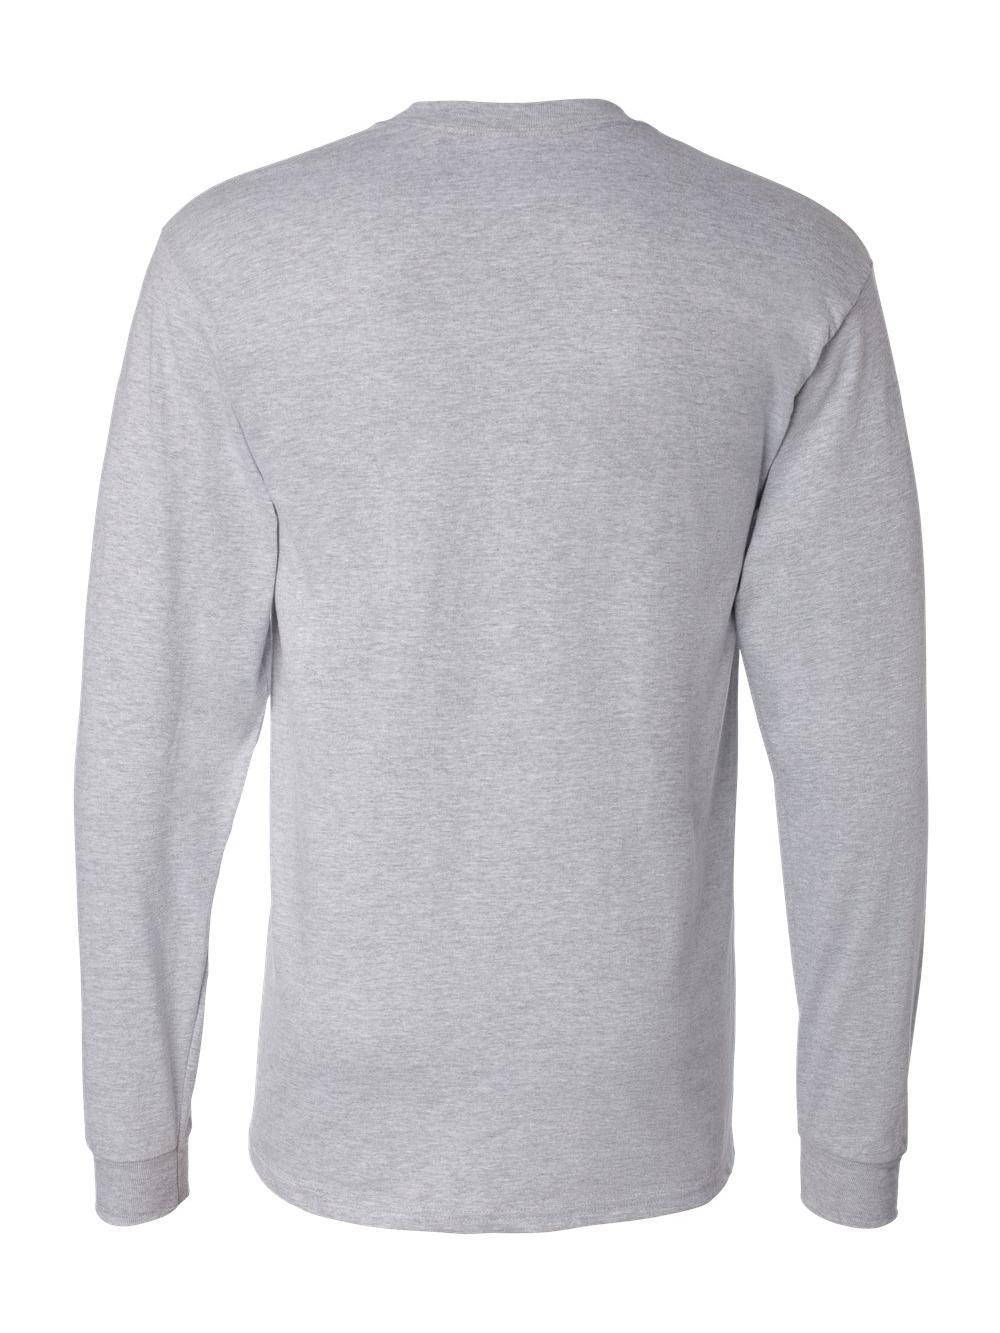 Hanes-Beefy-T-Long-Sleeve-T-Shirt-5186 thumbnail 34